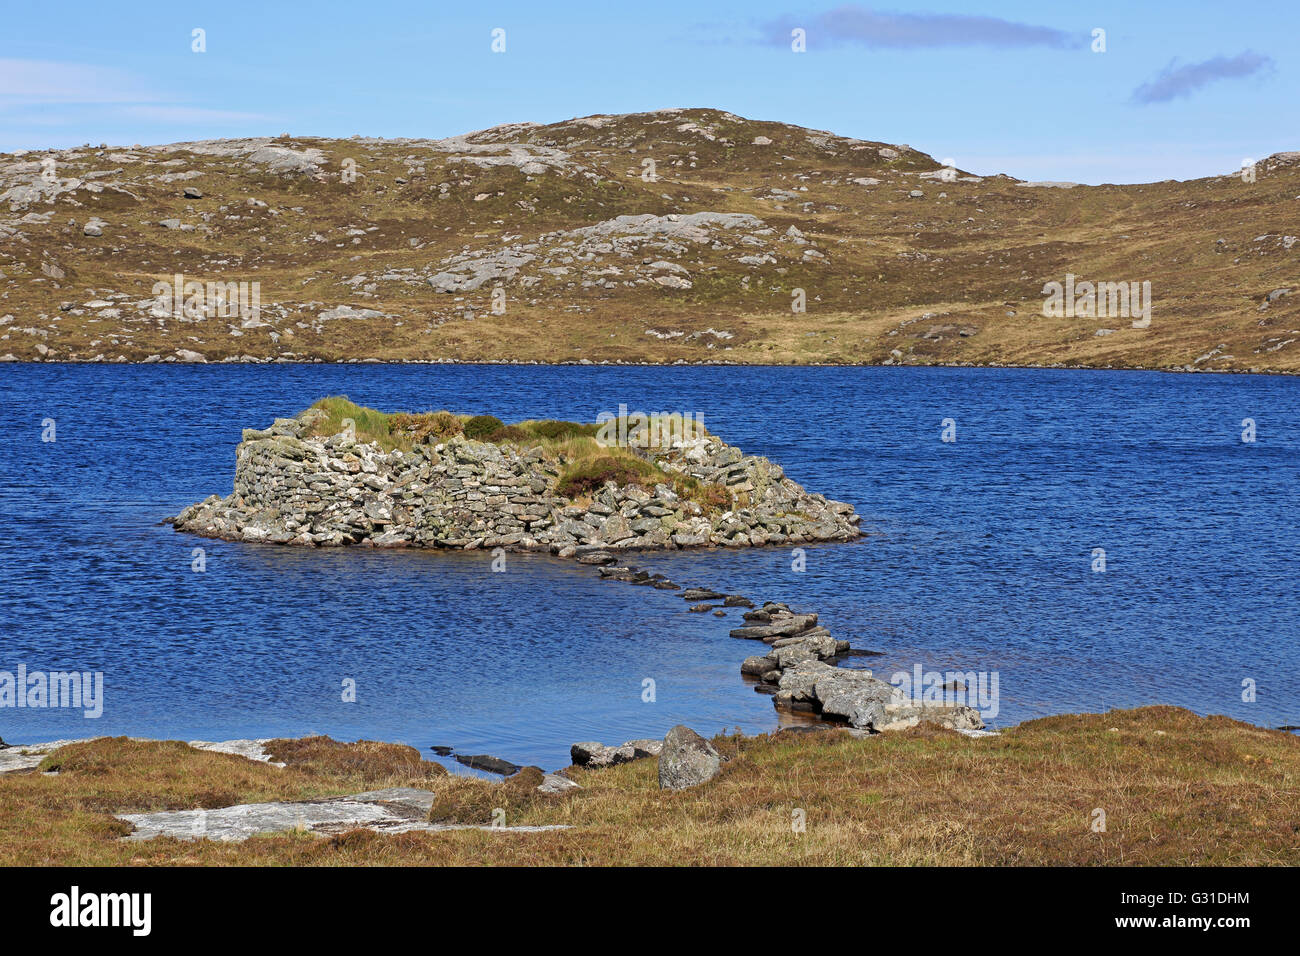 Dun on Loch An Duin on Taransay Island Outer Hebrides - Stock Image